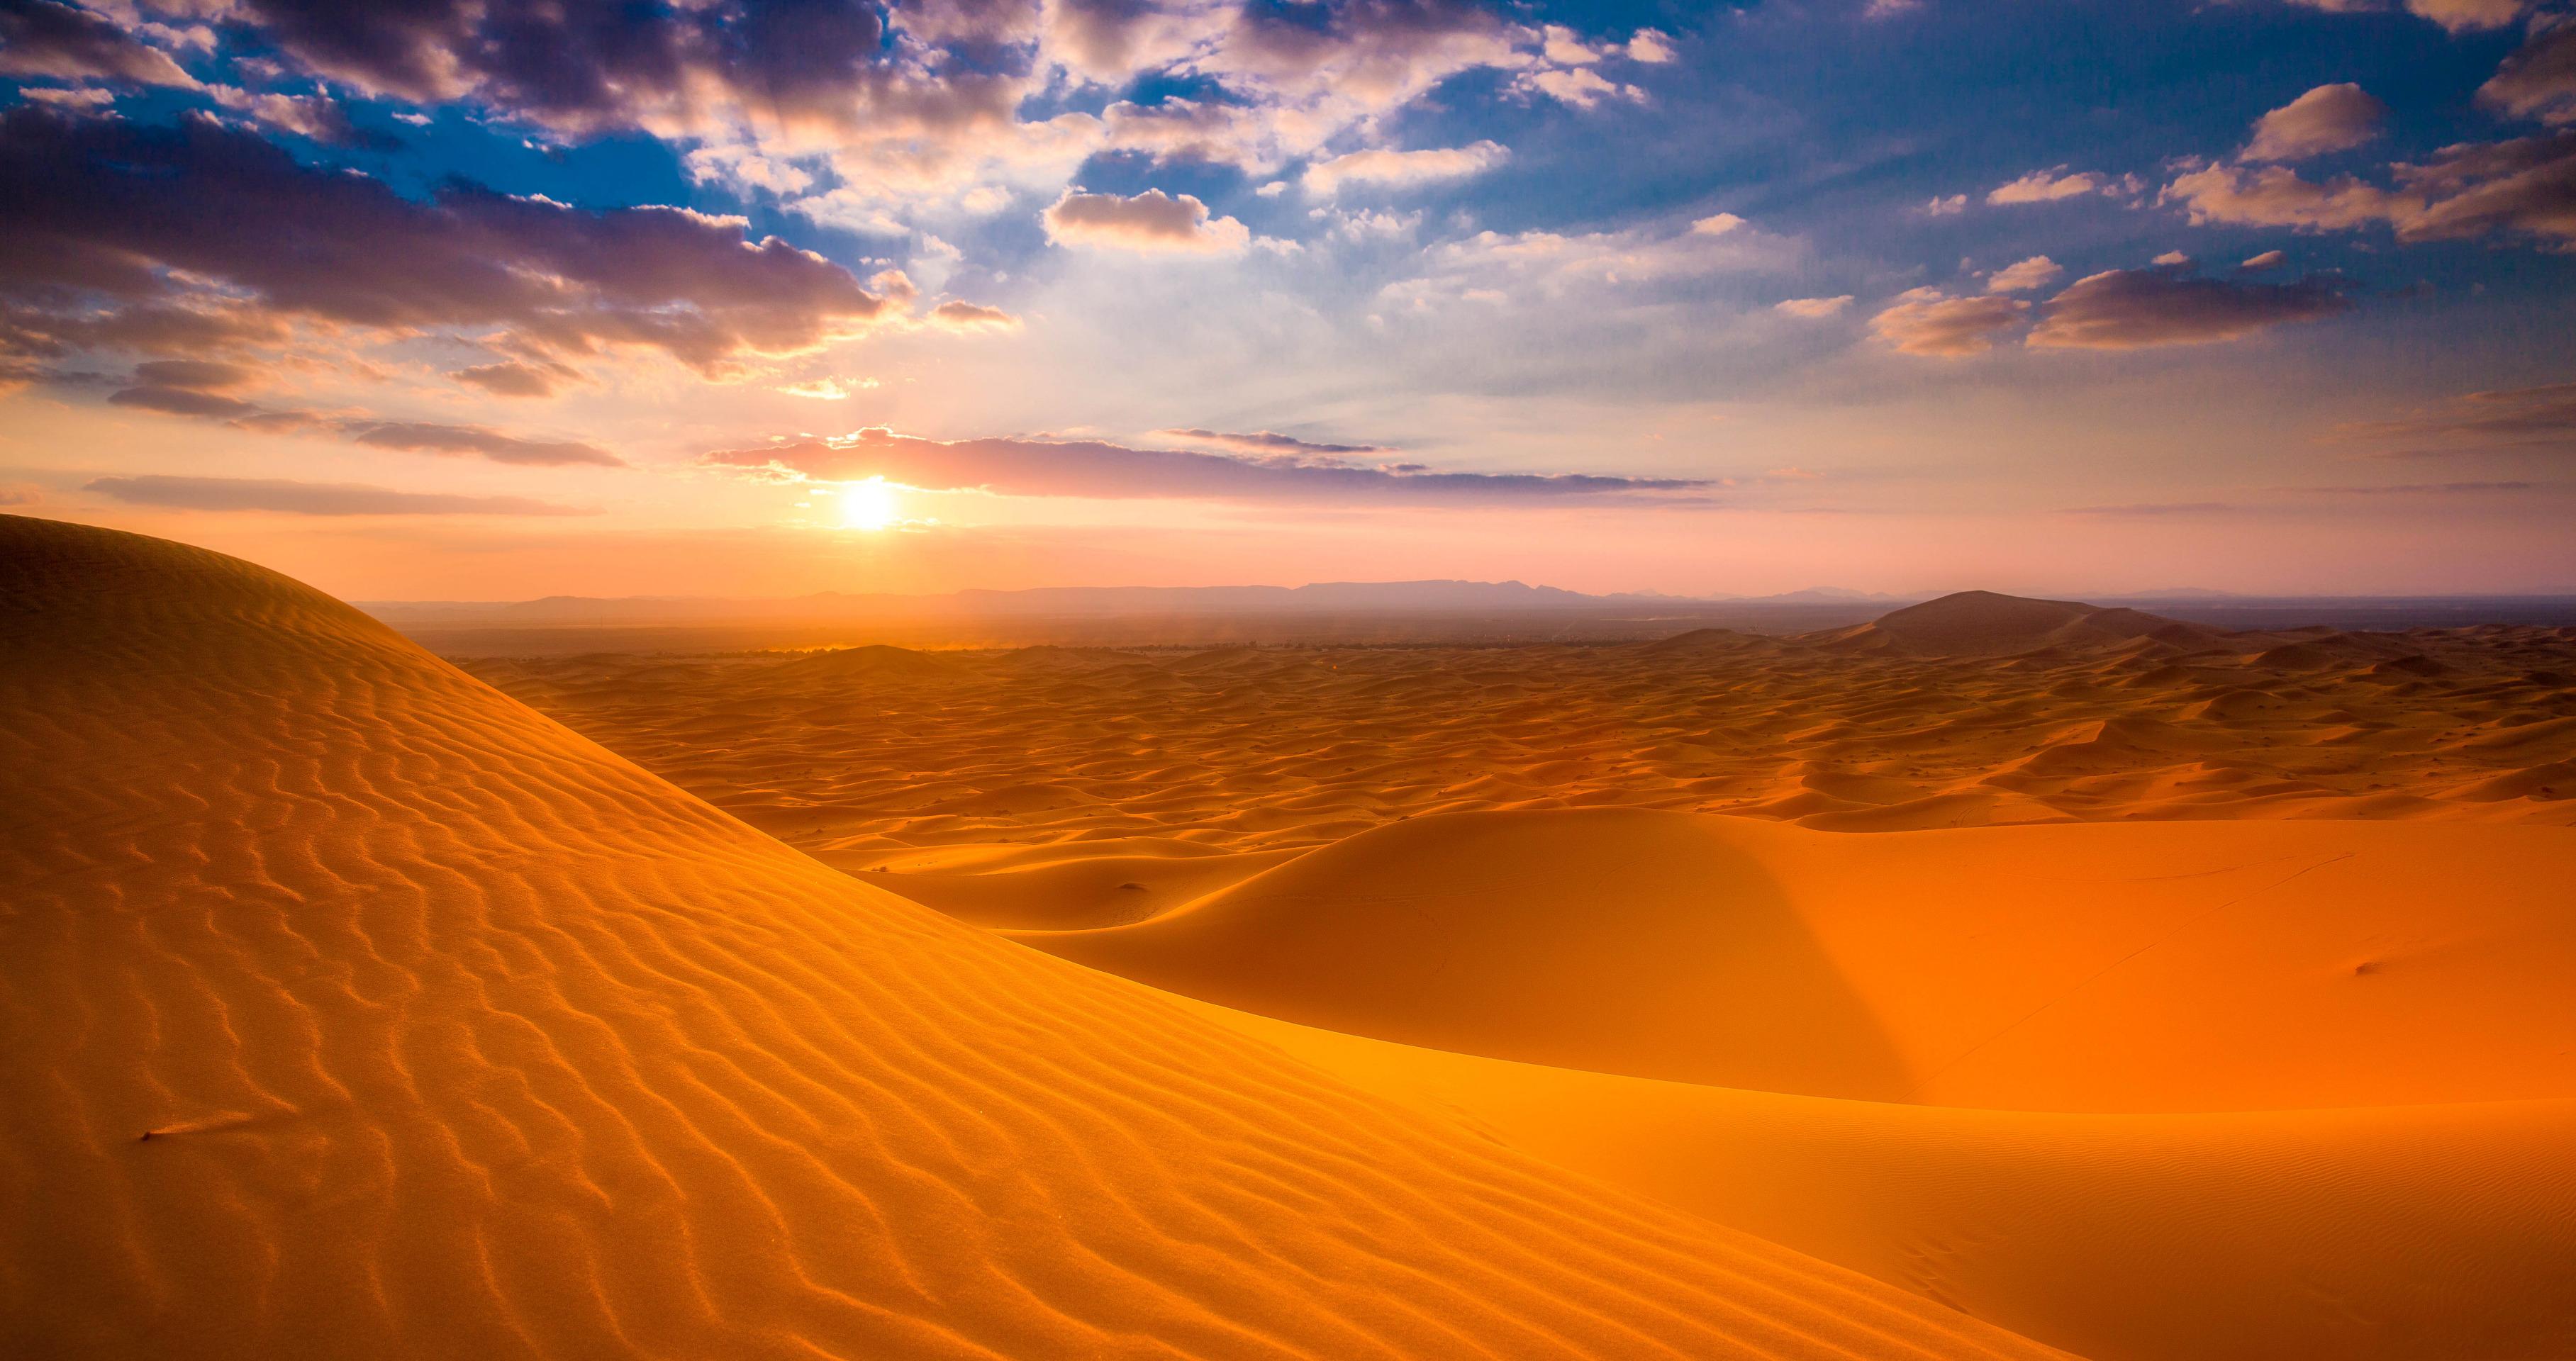 барханы пустыня дюны  № 1291911 без смс